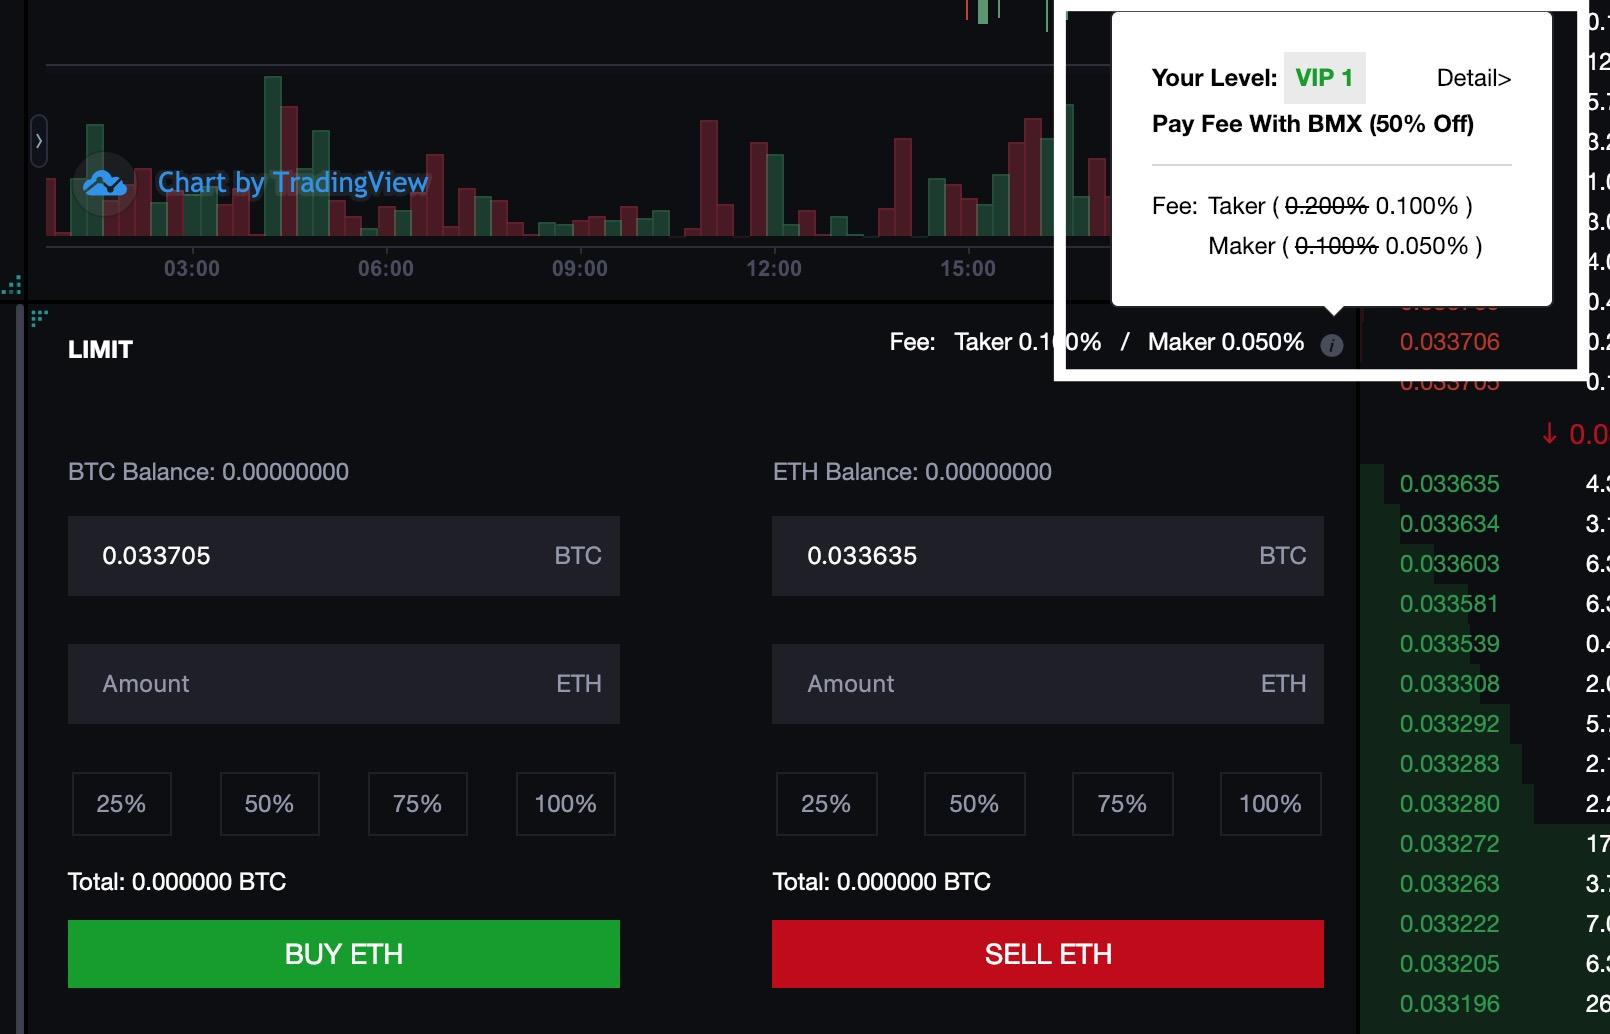 exchange______.jpg